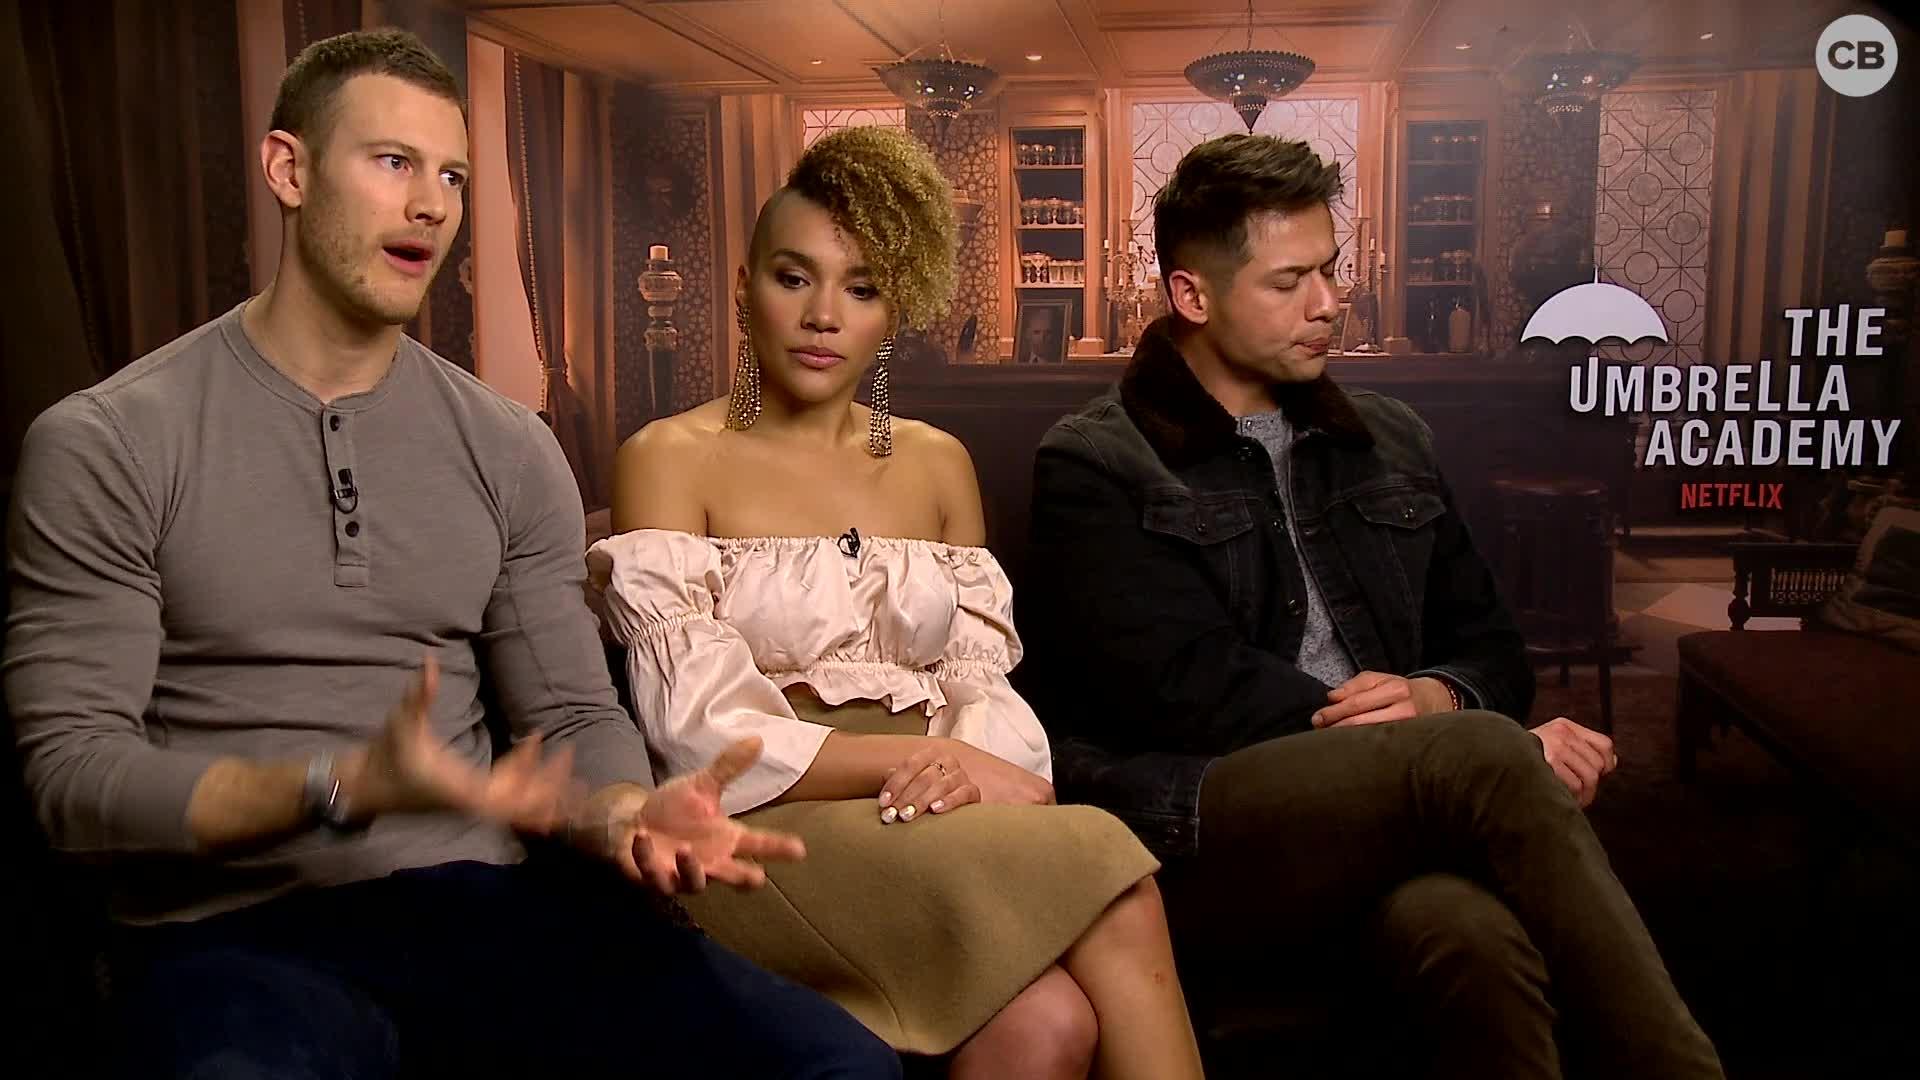 Tom Hopper, Emmy Raver-Lampman, and David Castaneda Talk 'The Umbrella Academy' screen capture